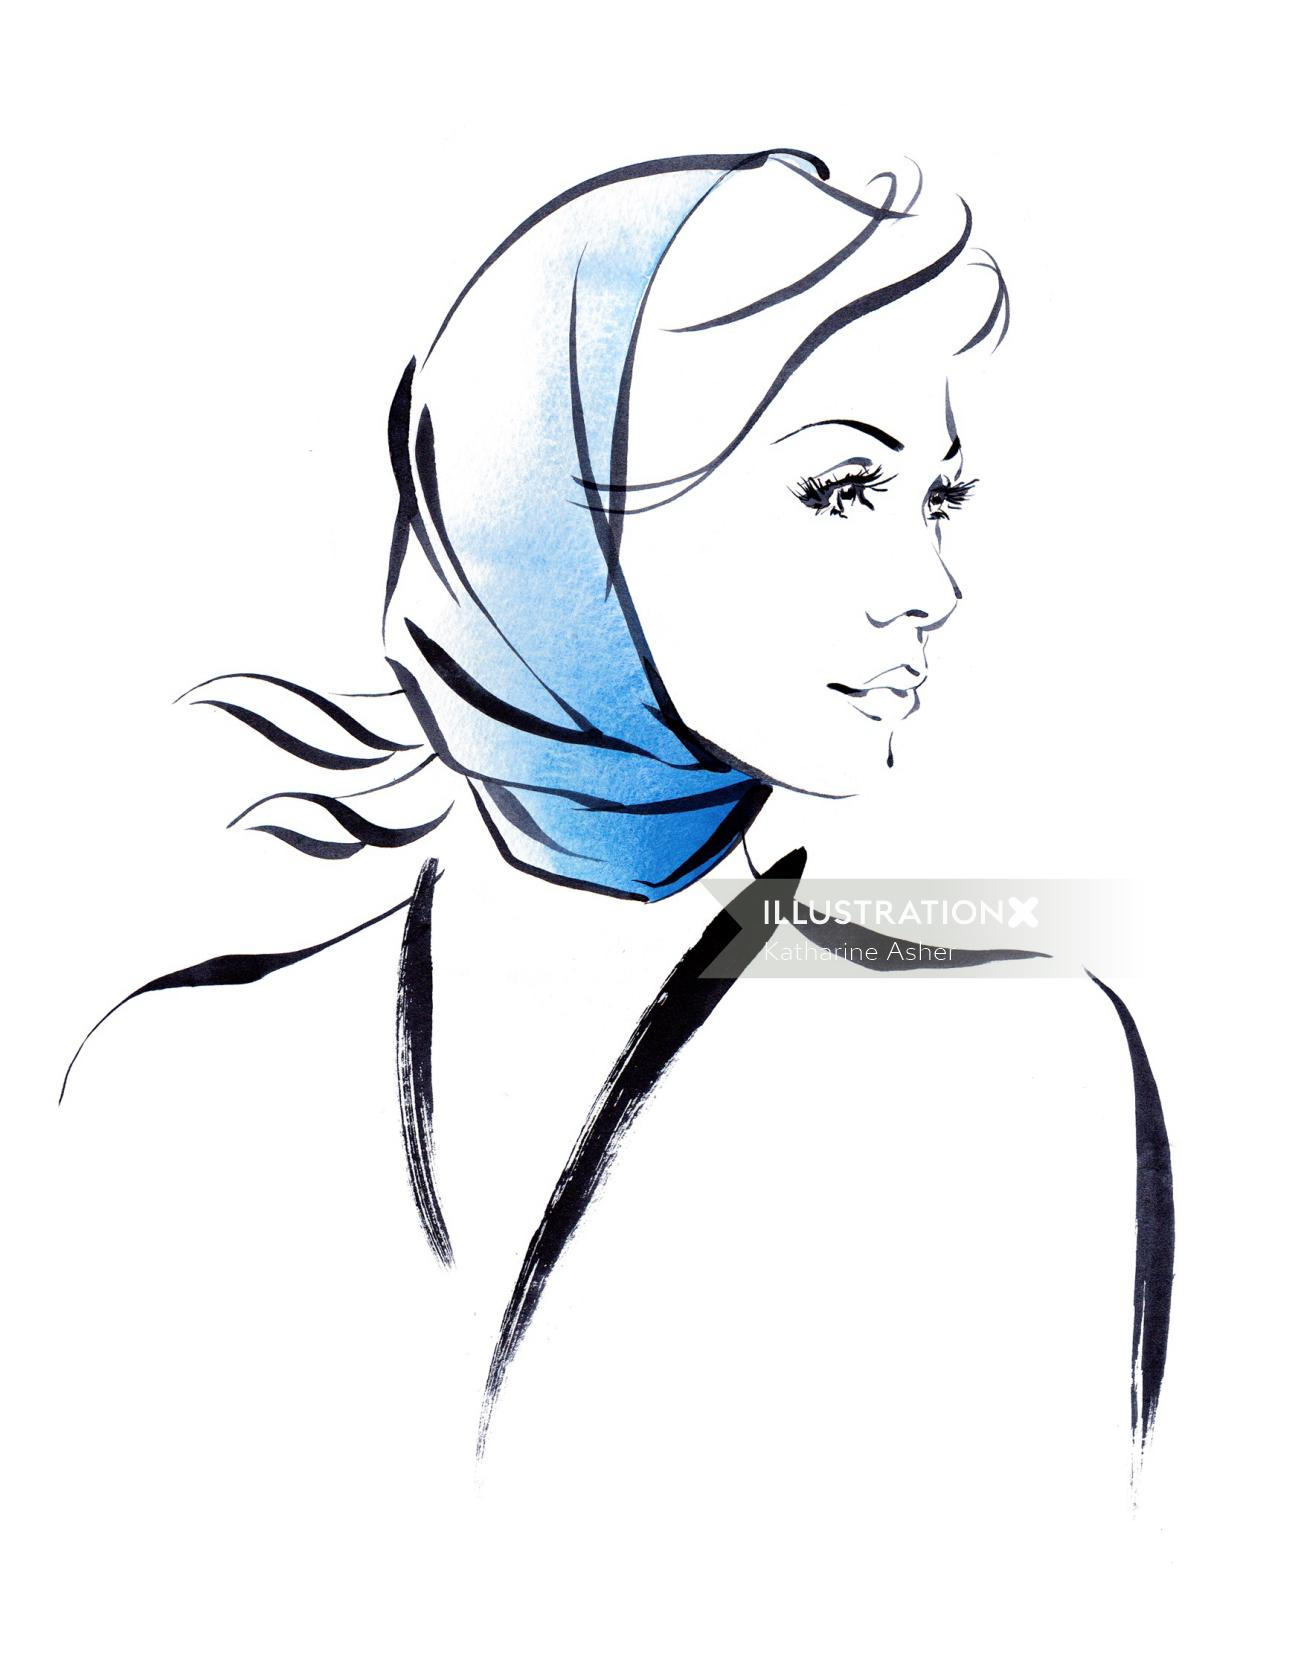 Headscarf styles illustration by Katharine Asher